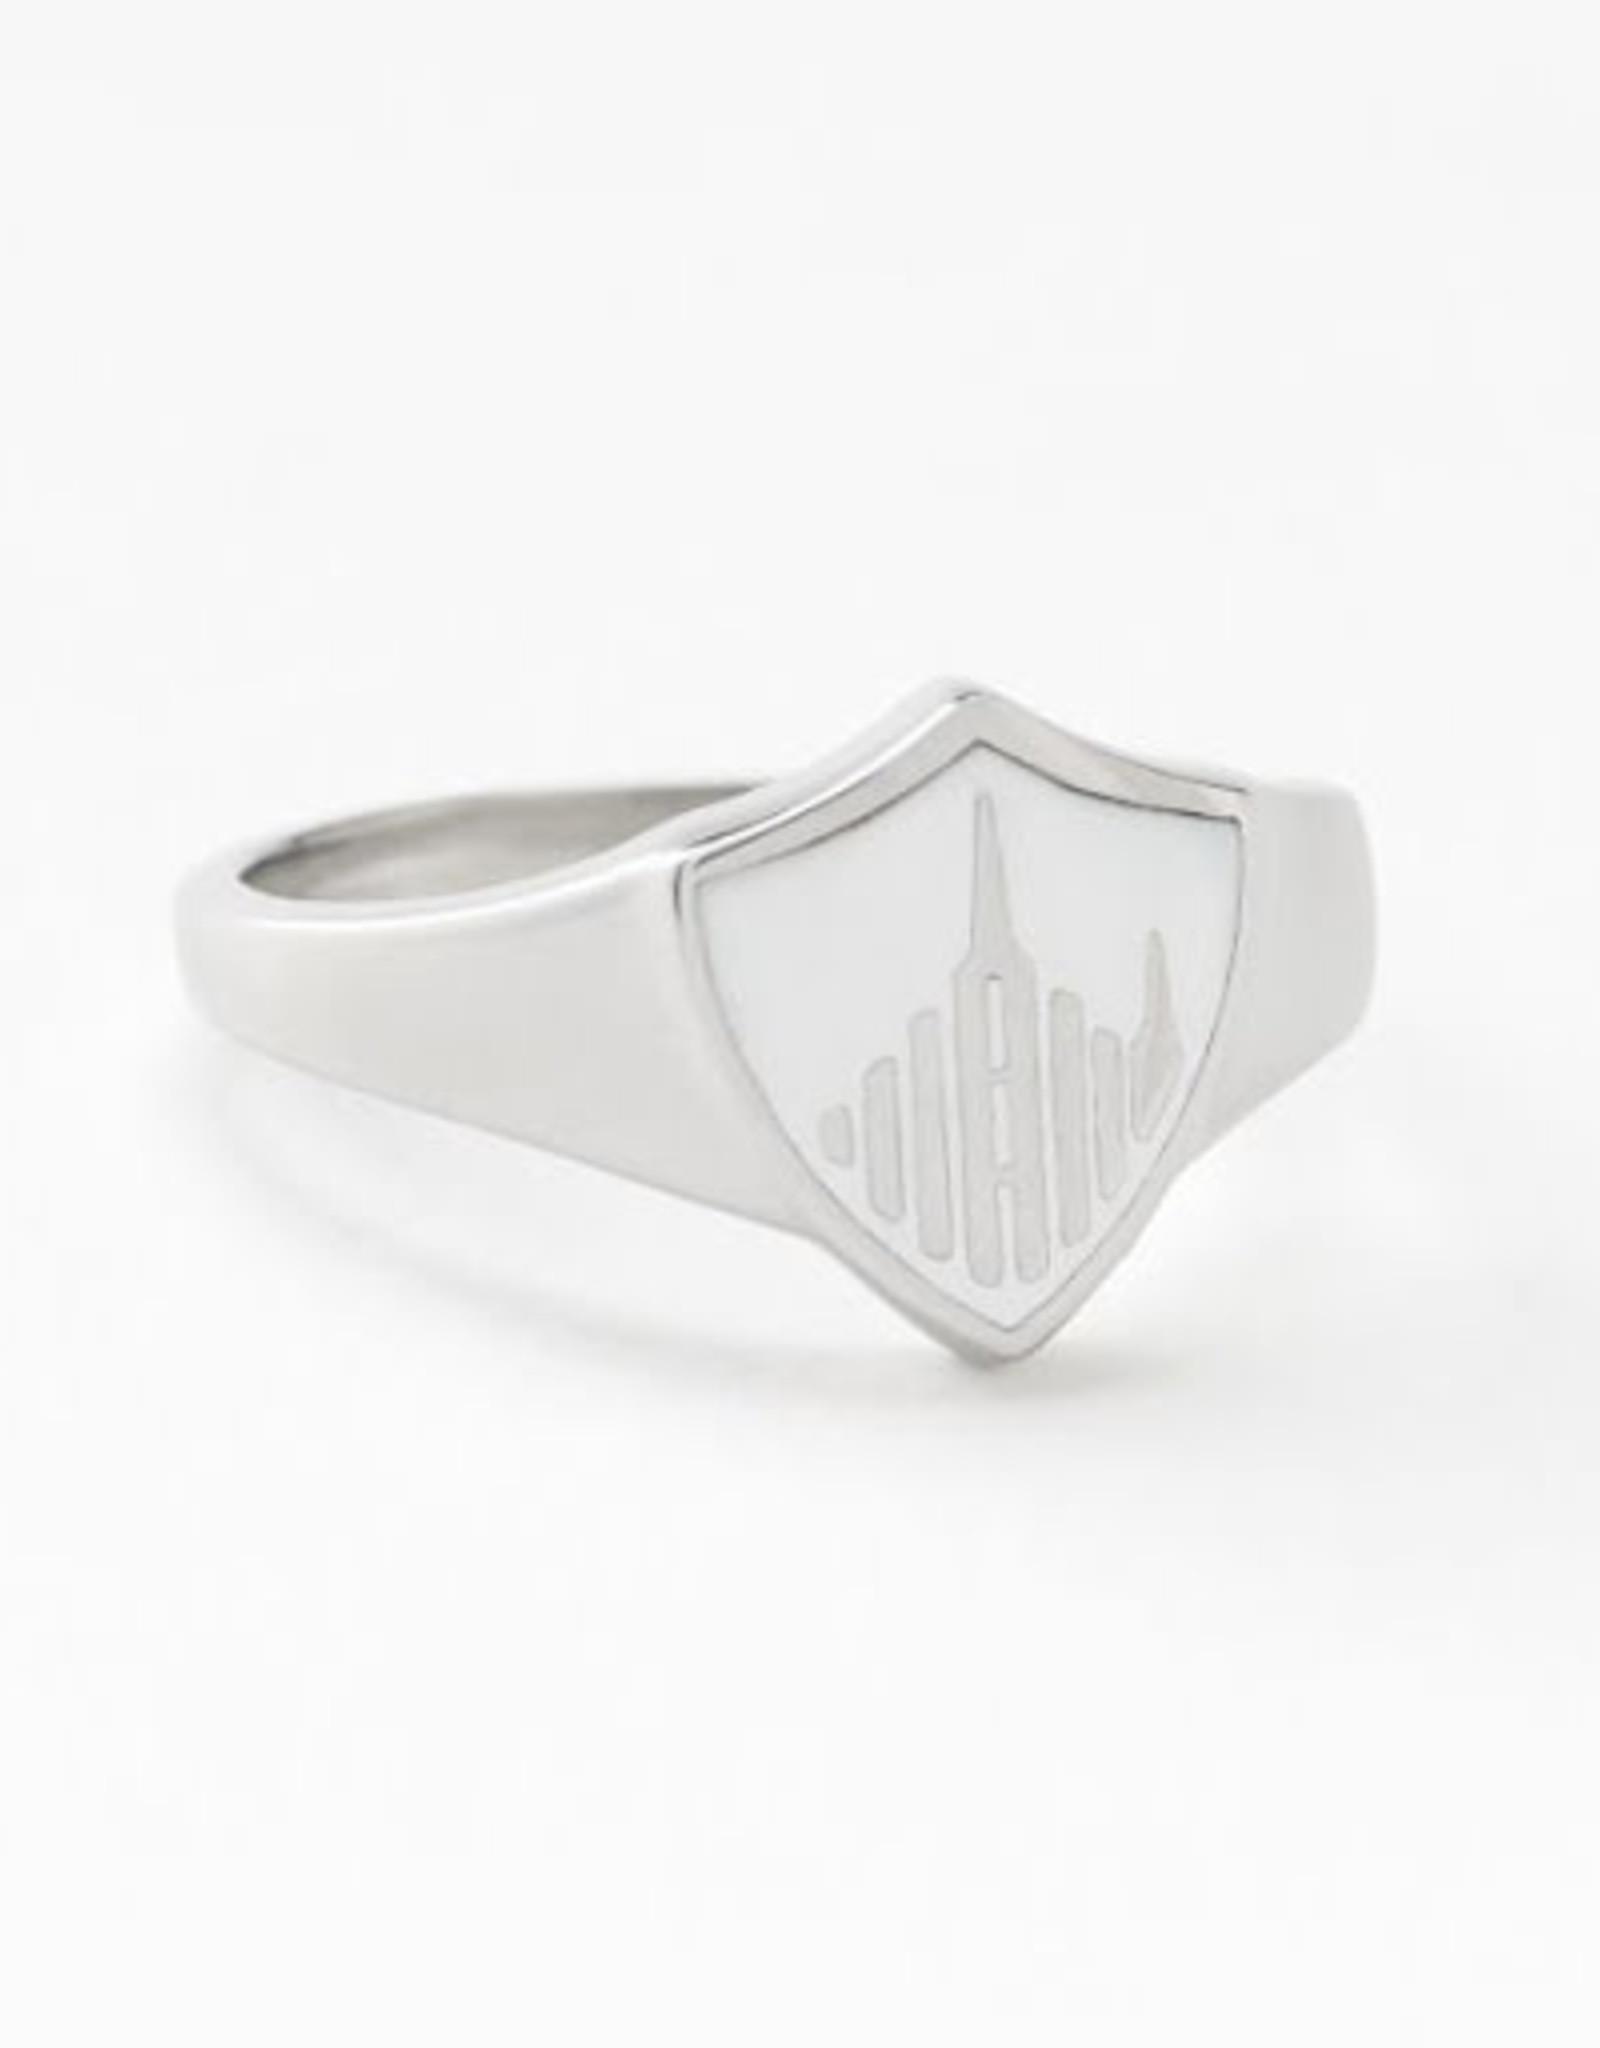 Small Children's Ring